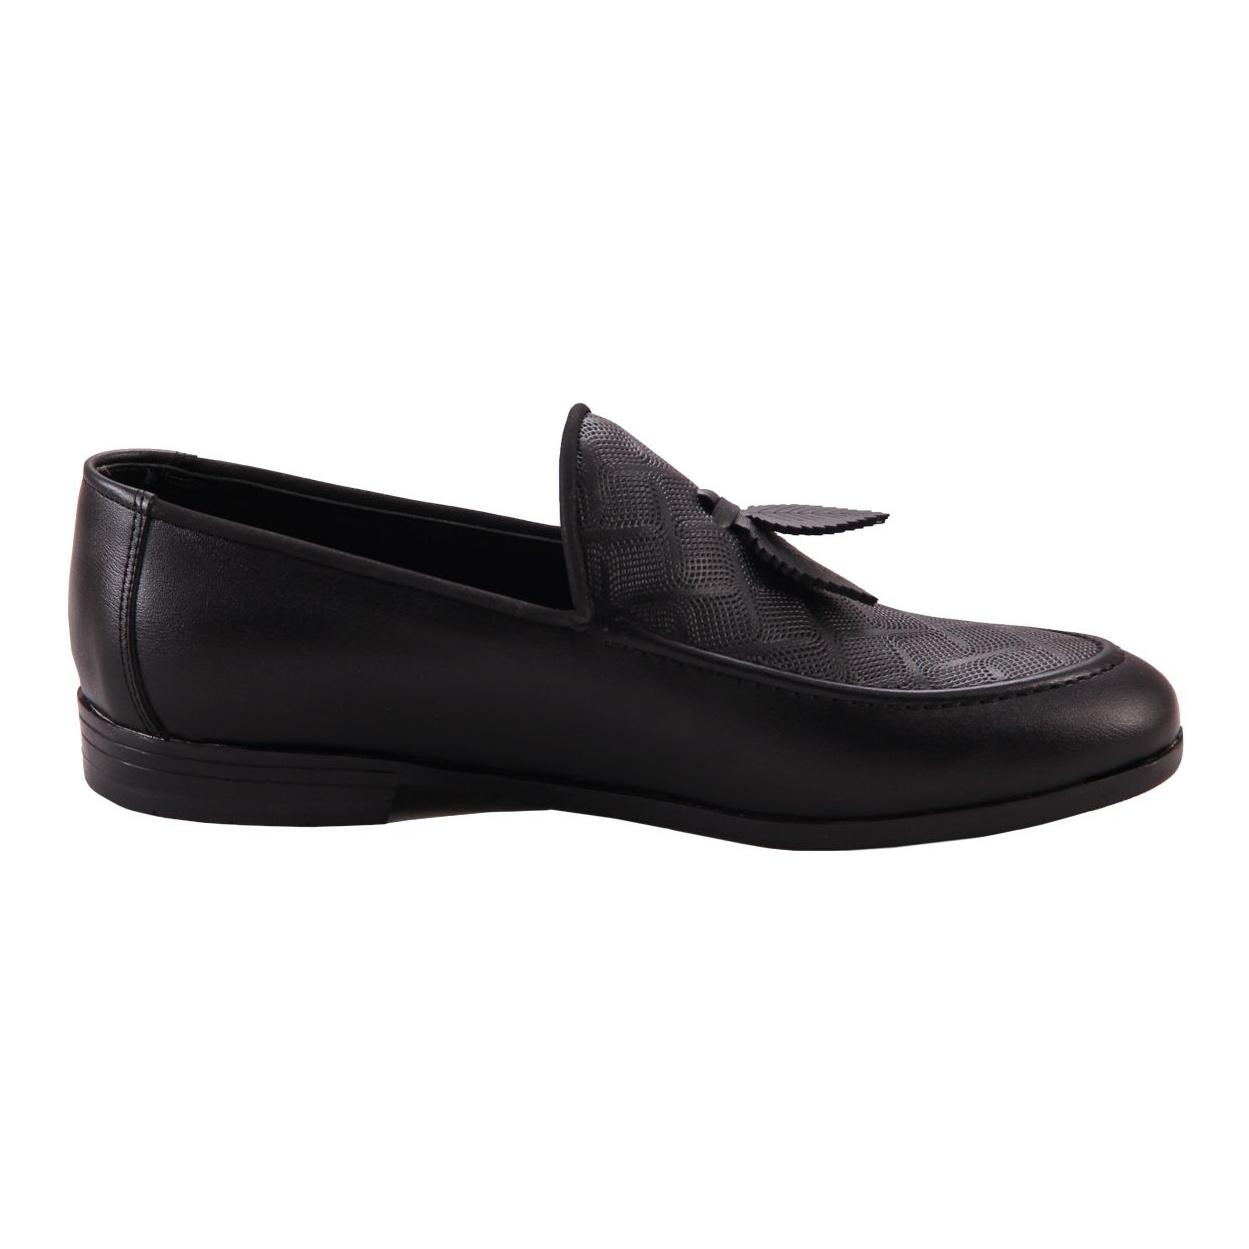 کفش مردانه مدل R28340-1 thumb 2 3